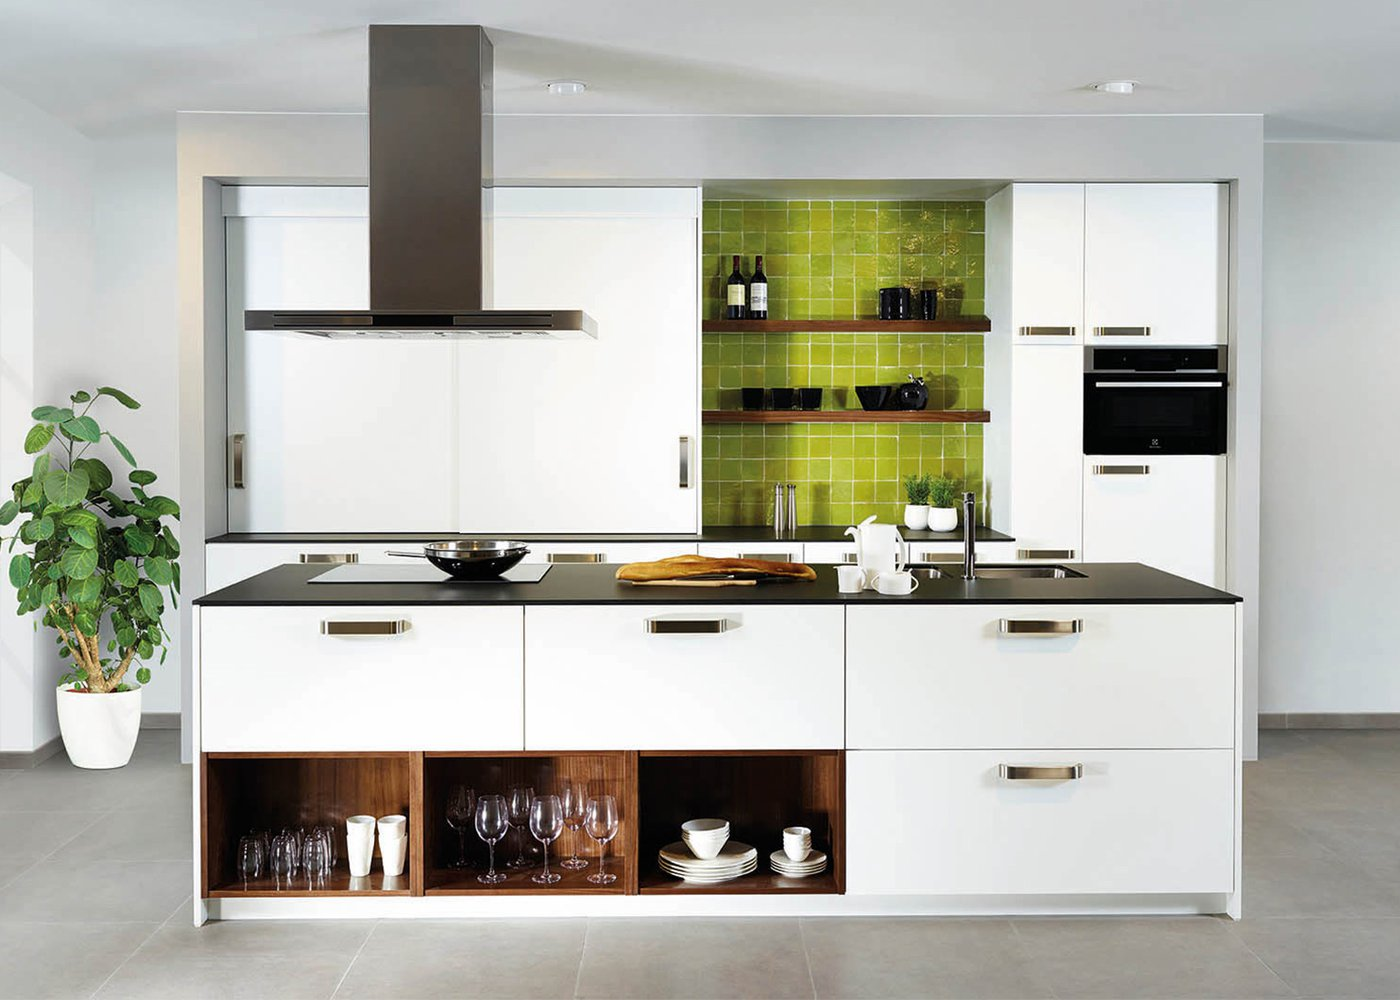 Moderne witte keuken in frontlaminaat - Model Toronto